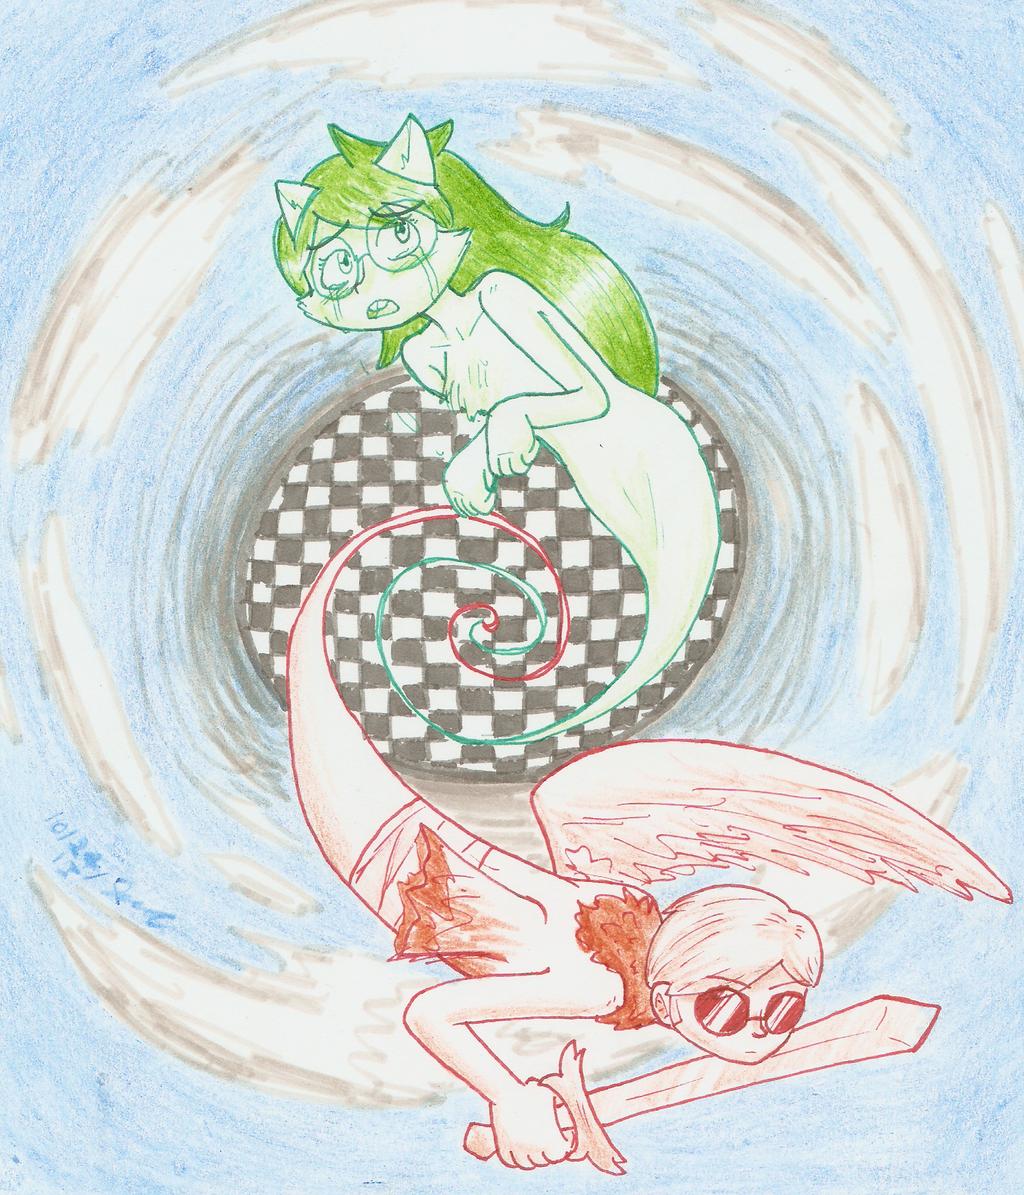 Sprites in Skaia by Mister-Saturn